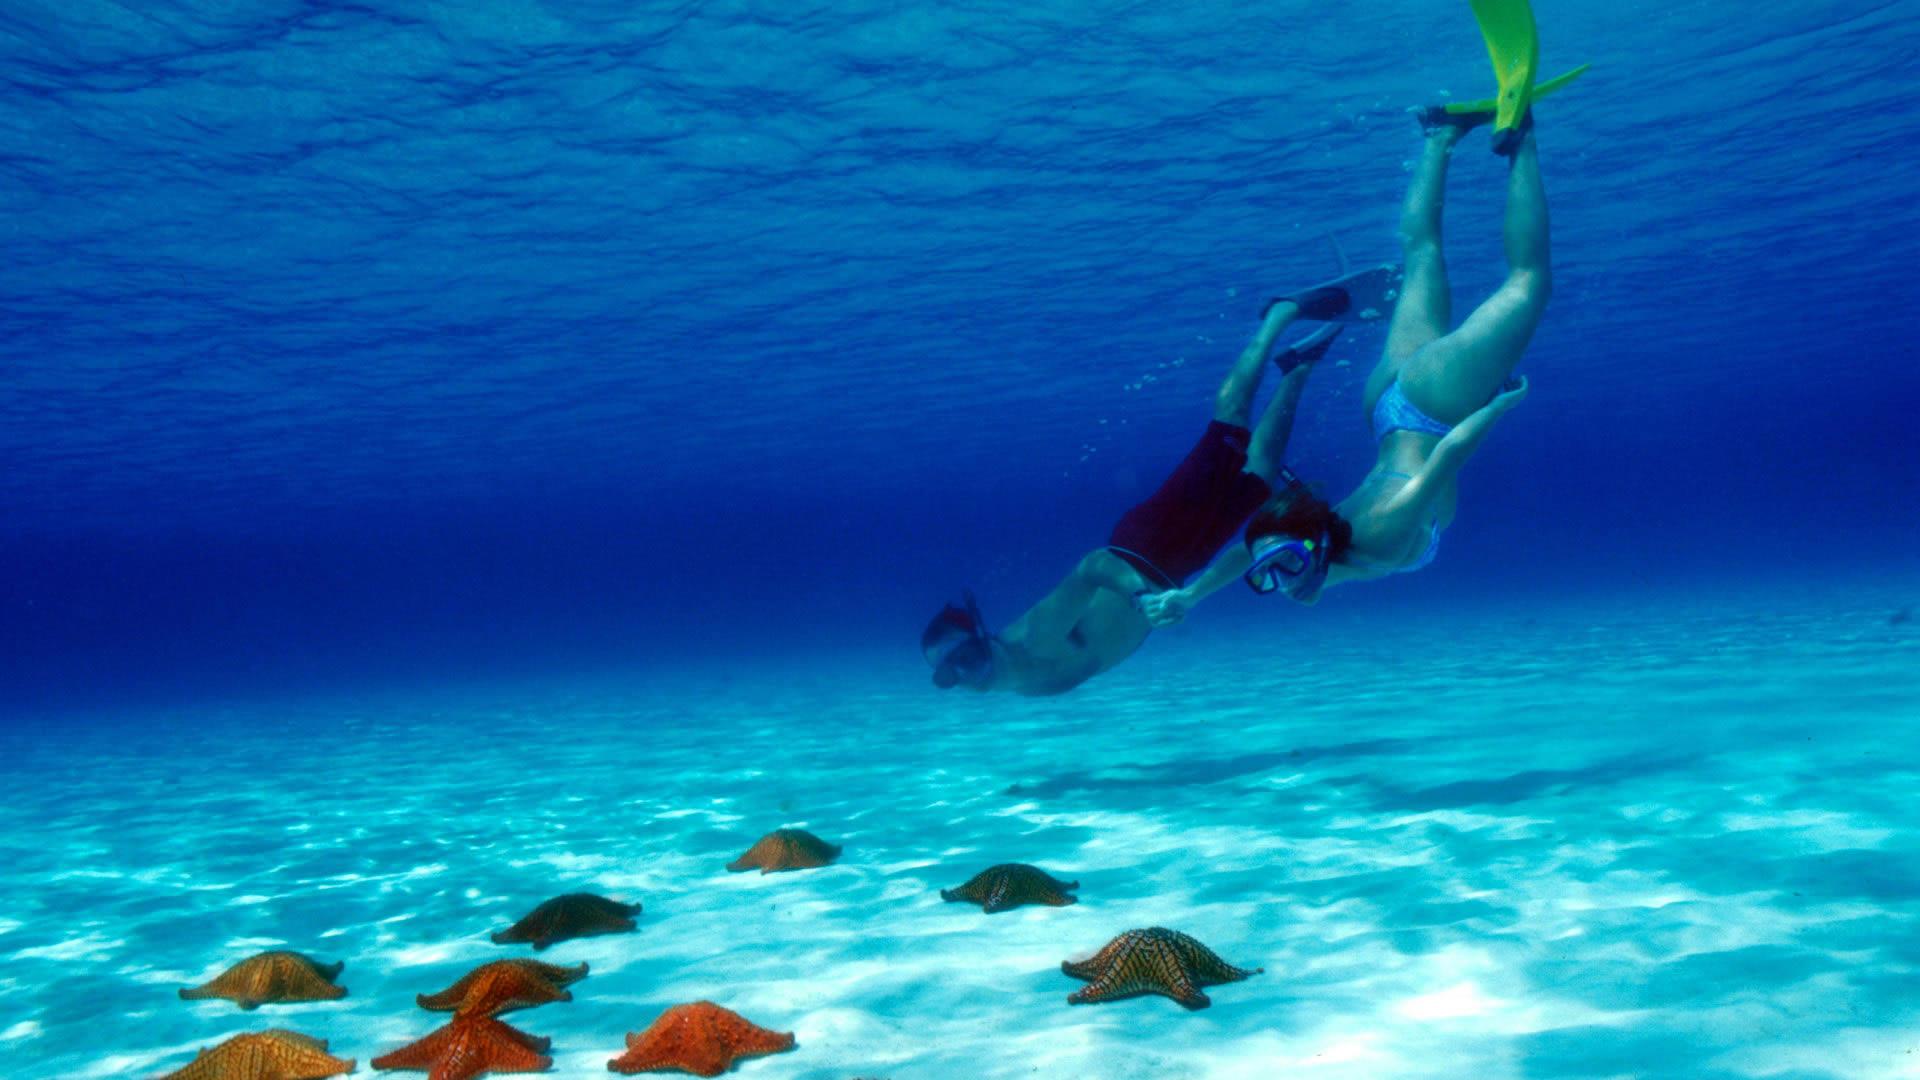 Resultado de imagen para buceo en cancun cozumel